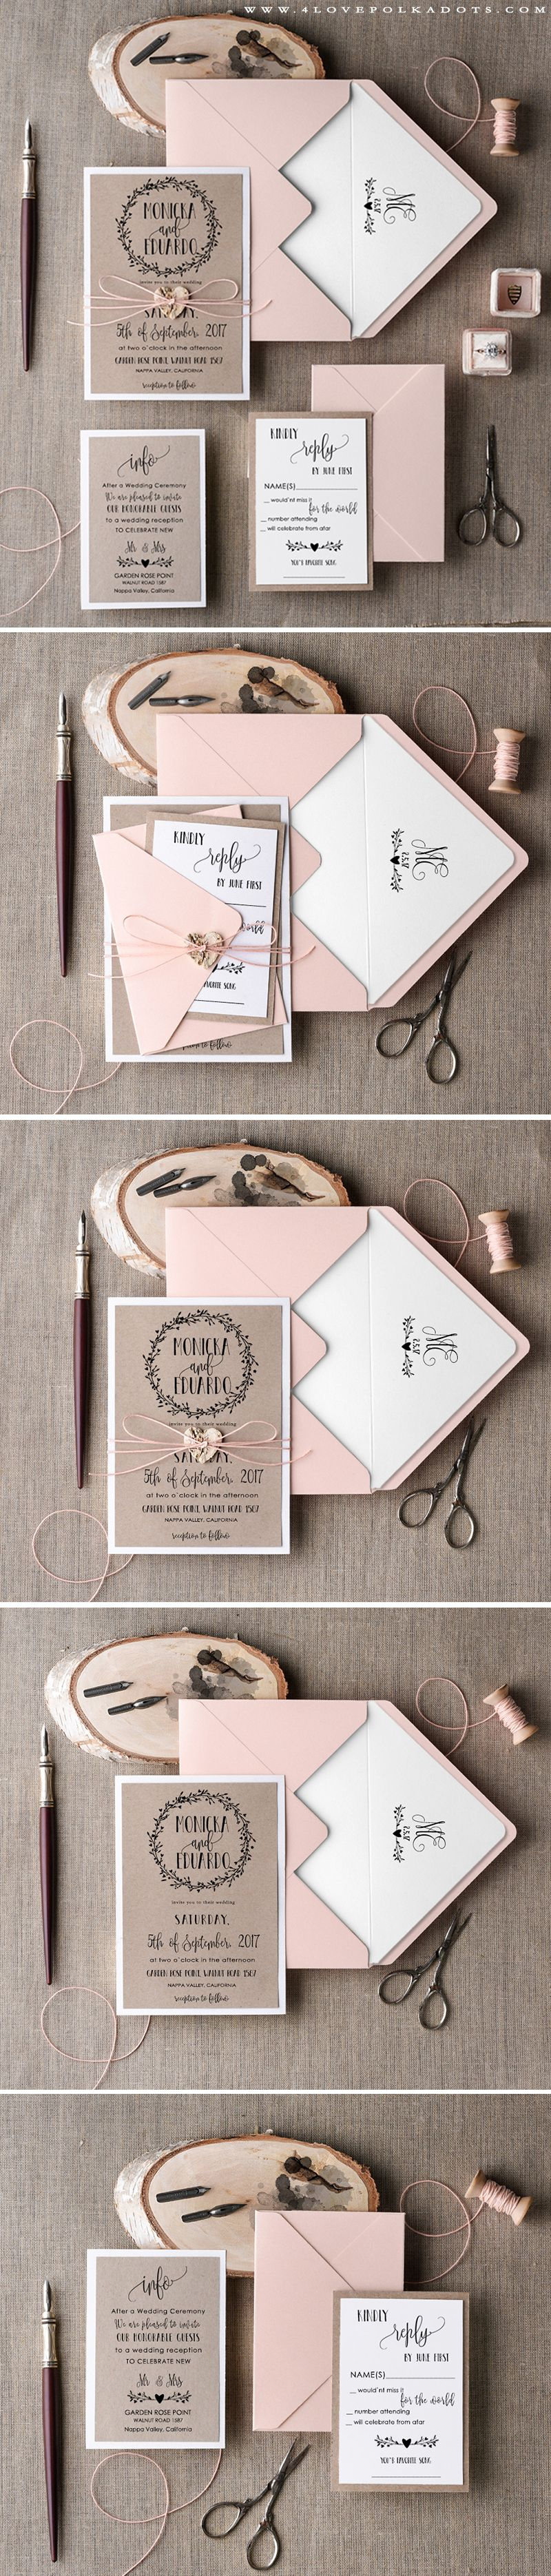 rustic wedding invitations do it yourself%0A Handmade Wedding Invitation with wreath monogram  summerwedding   weddingideas  Handmade Wedding InvitationsWeding Invitation IdeasWedding